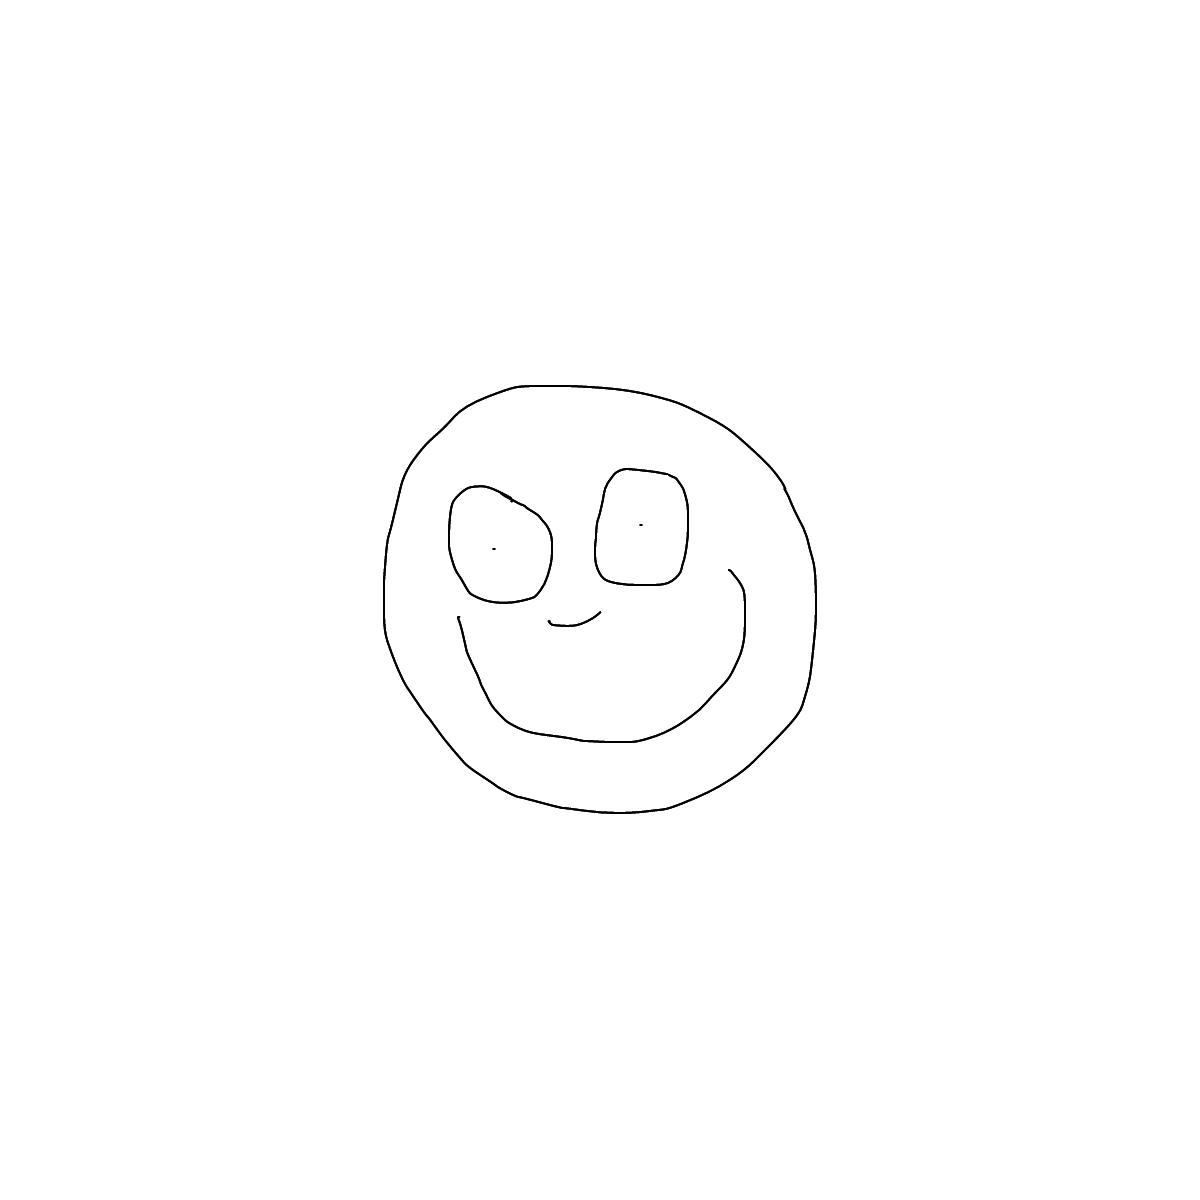 BAAAM drawing#9362 lat:29.7557621002197270lng: -95.3875122070312500